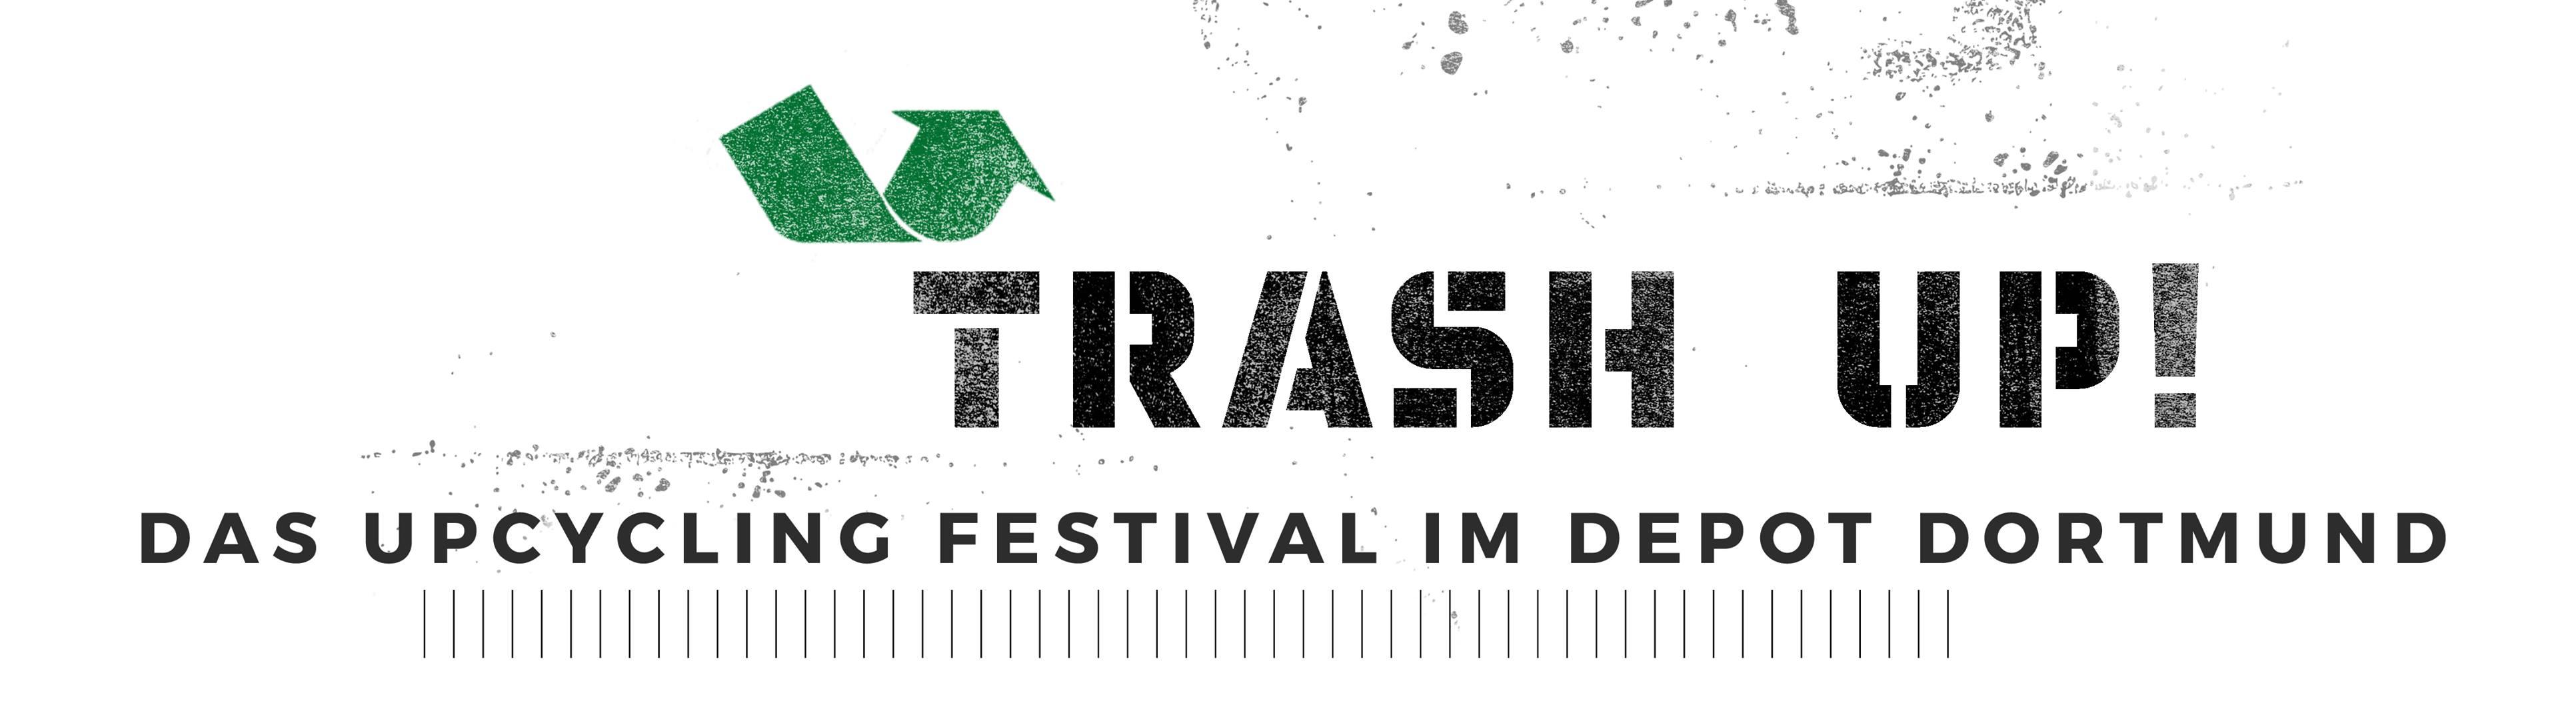 Trash Up! Das Upcycling Festival im Depot Dortmund am 12.11 und 13.11.2016